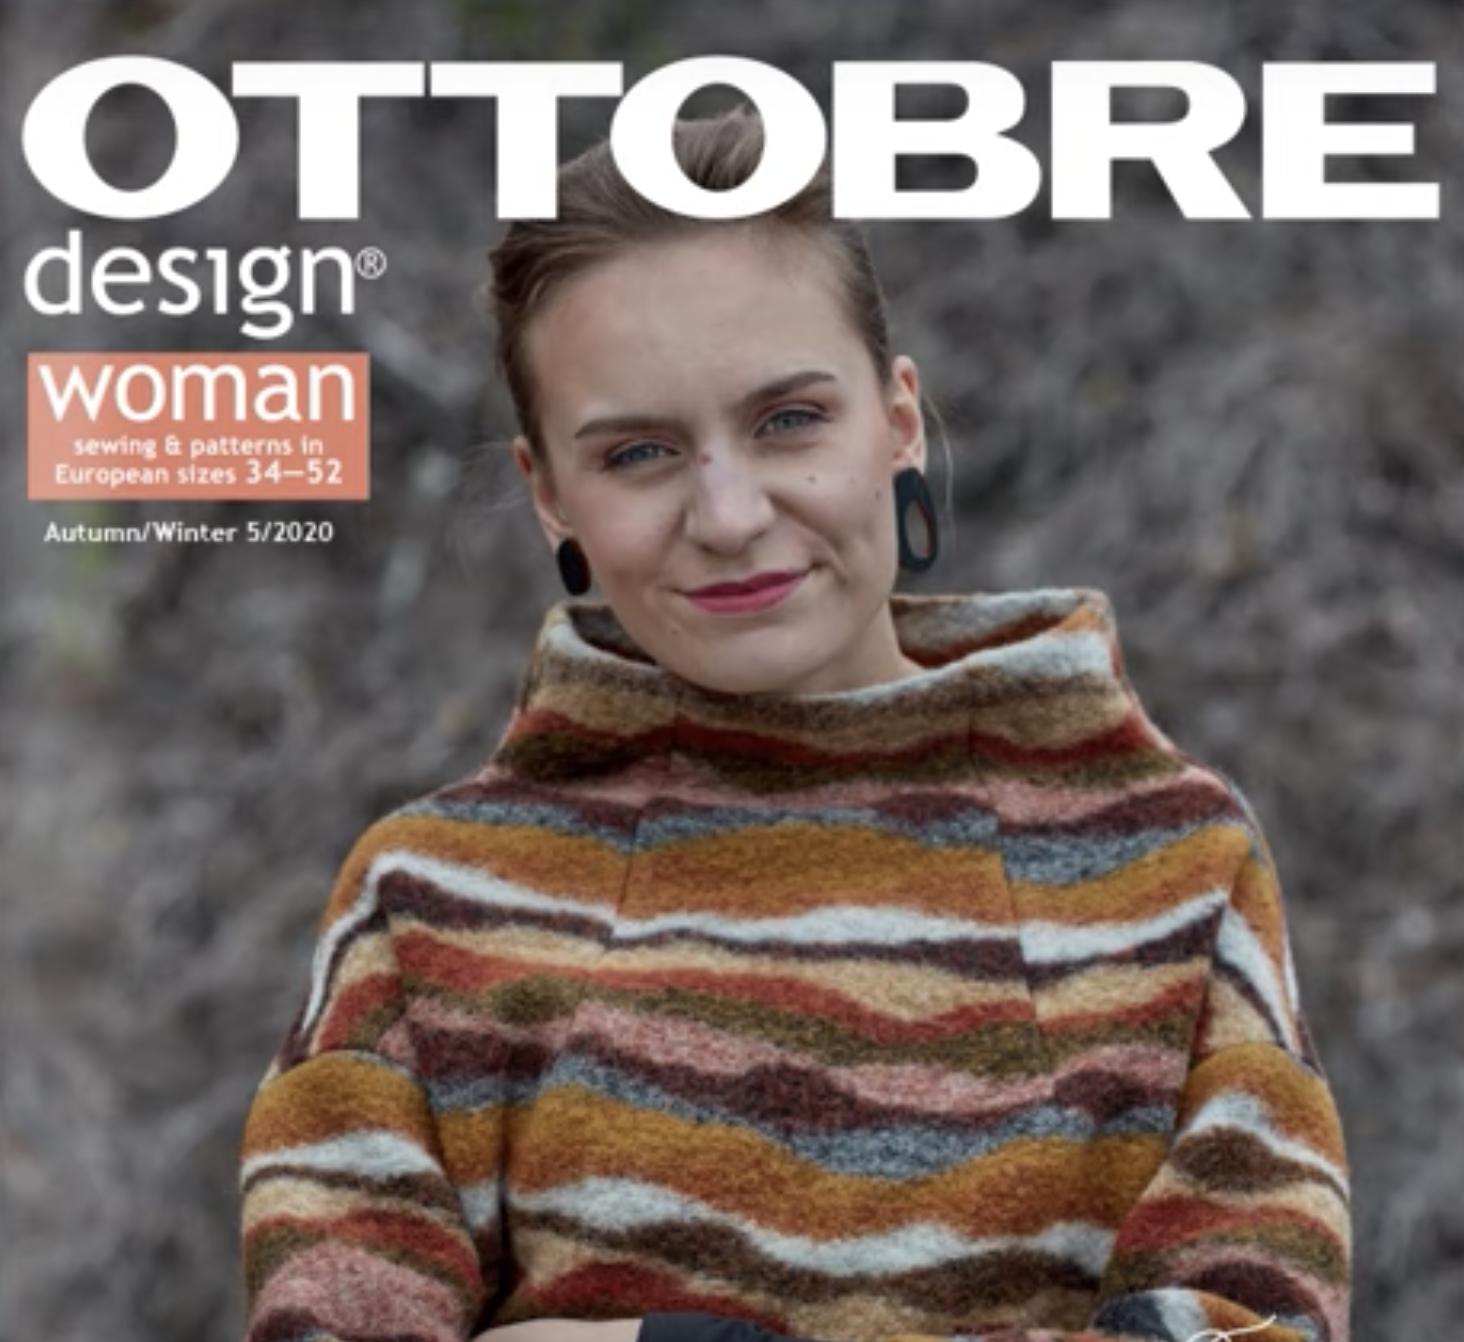 Журнал OTTOBRE design autumn/winter 5/2020